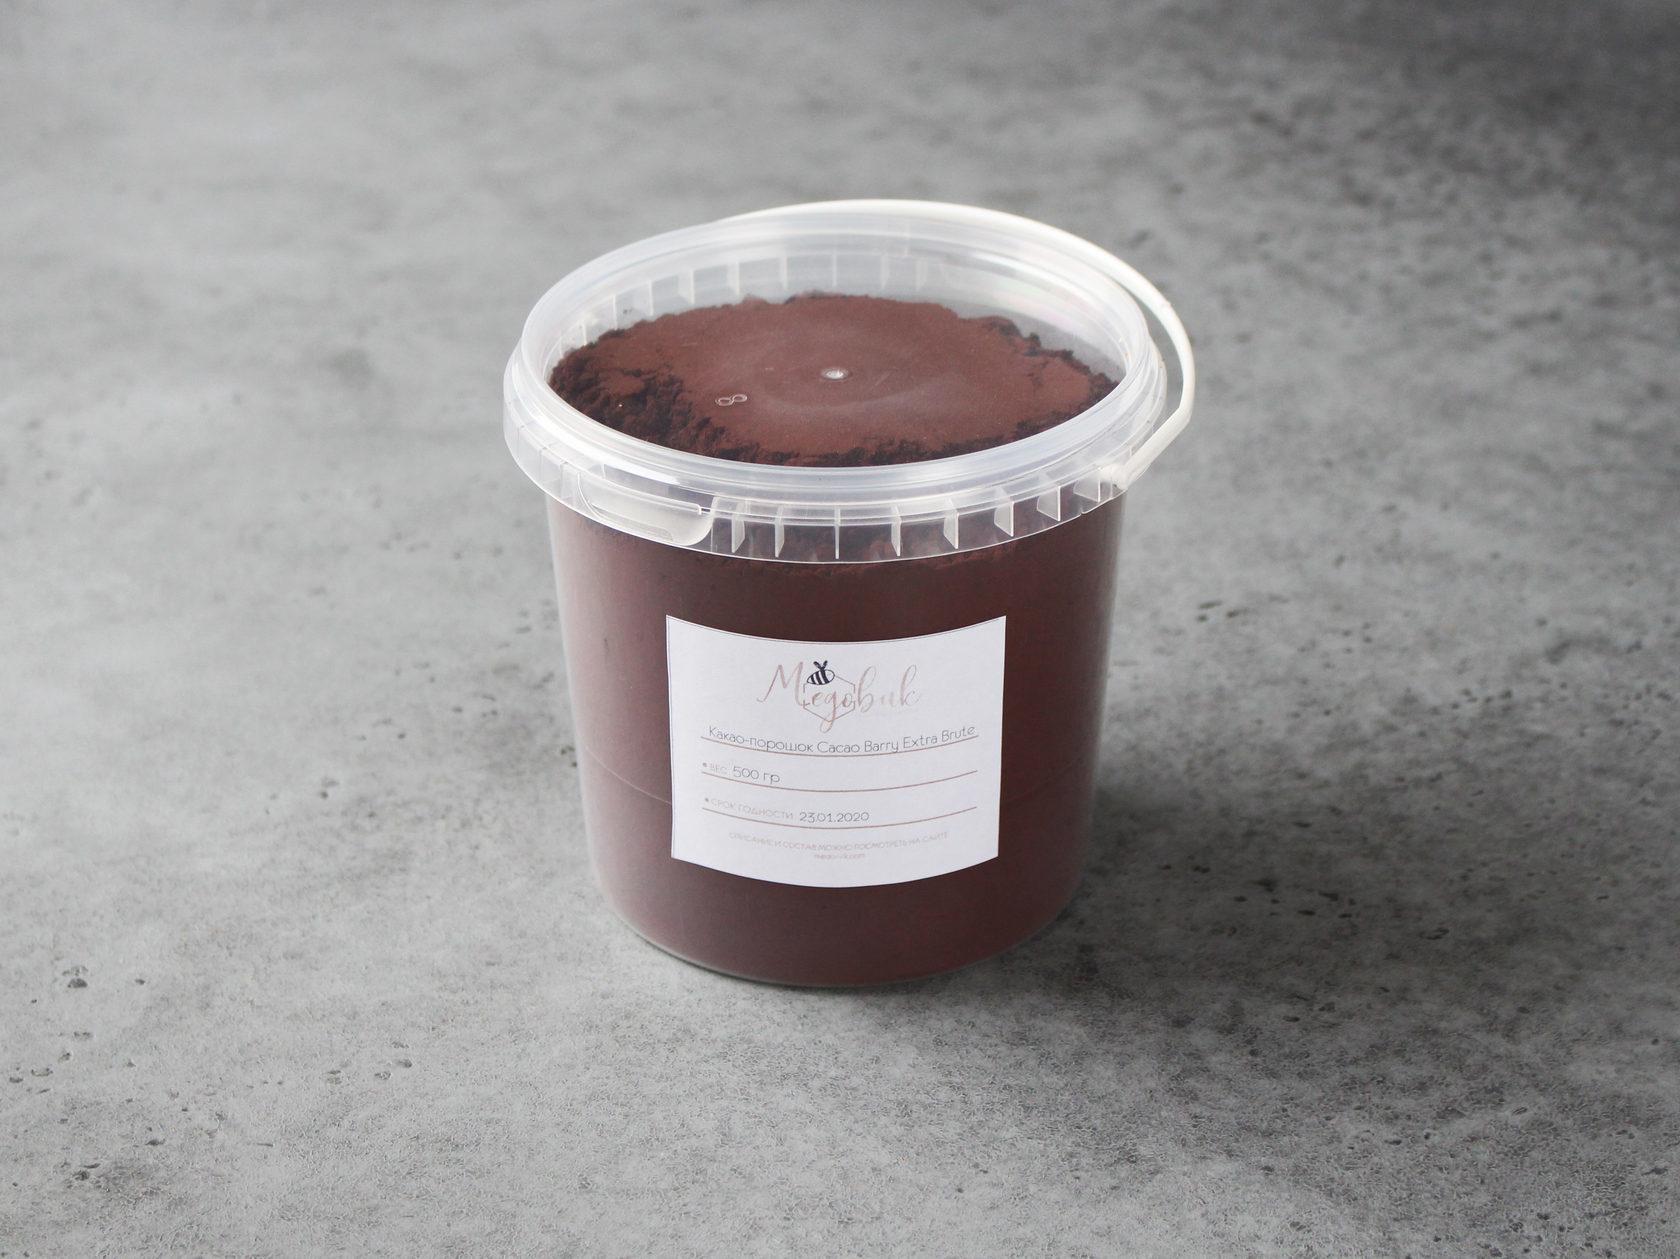 Какао-порошок Cacao Barry Extra Brute, 500 гр